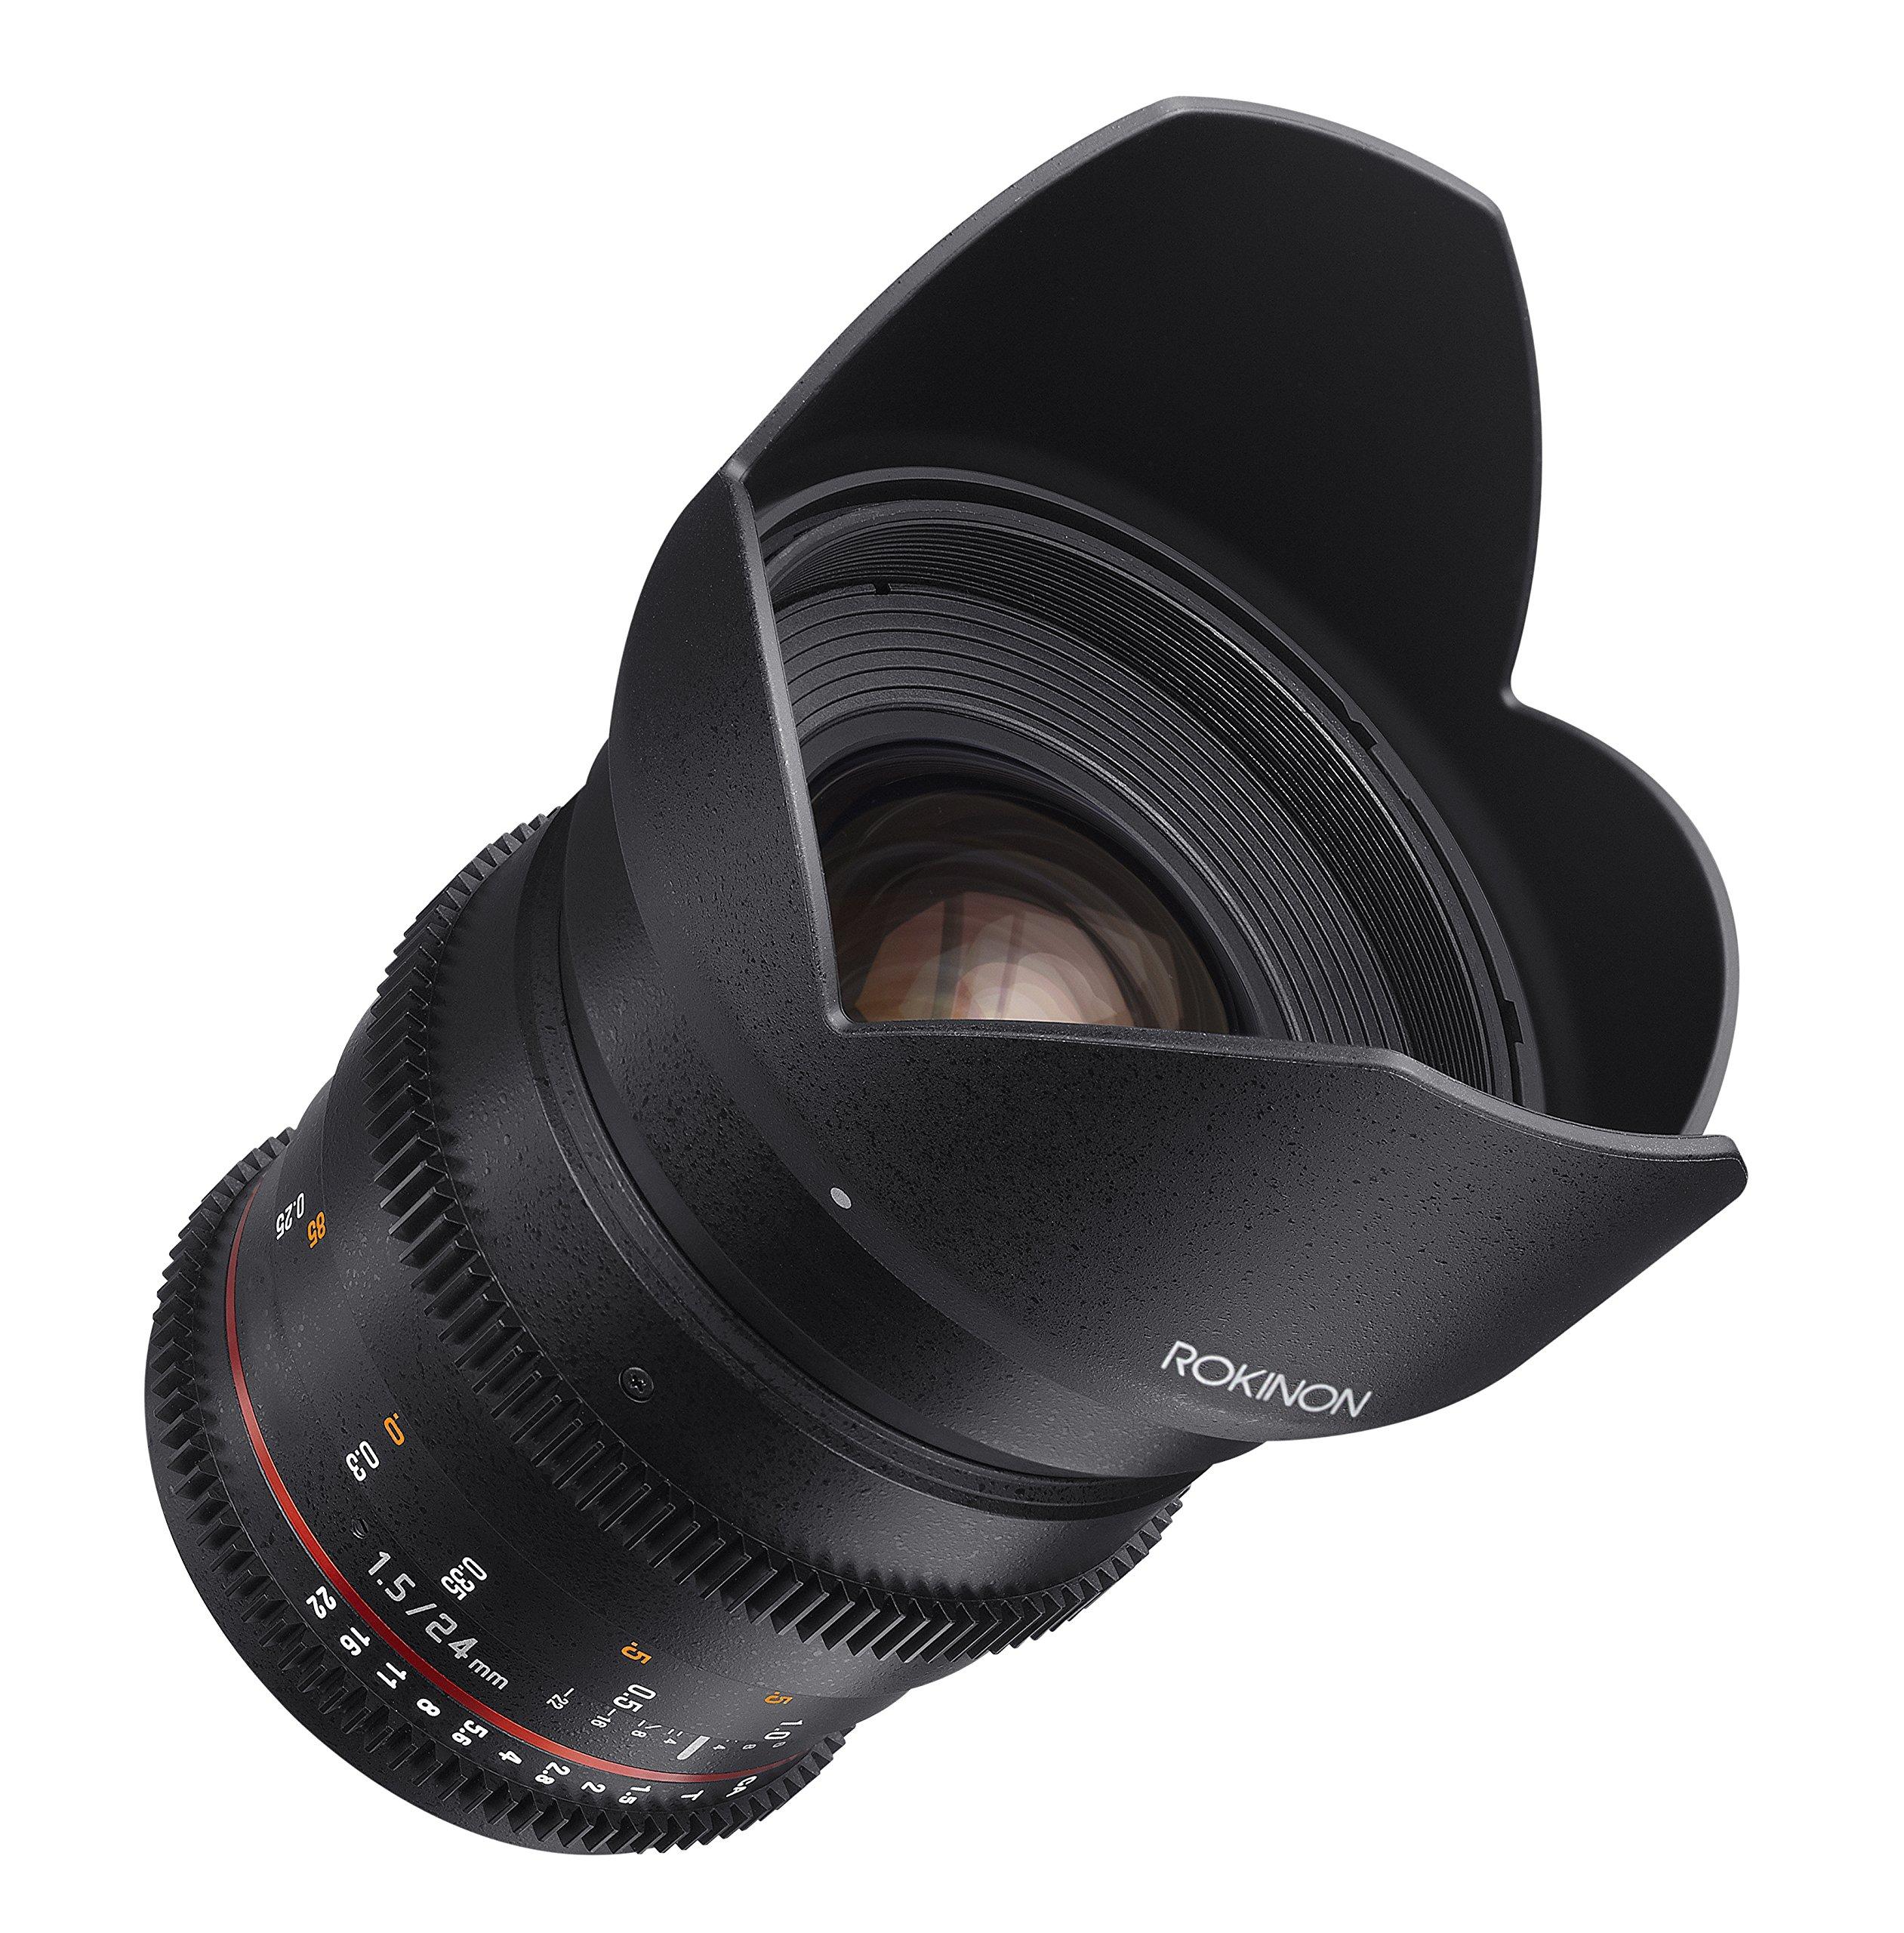 Rokinon Cine DS DS24M-N 24mm T1.5 ED AS IF UMC Full Frame Cine Wide Angle Lens for Nikon by Rokinon